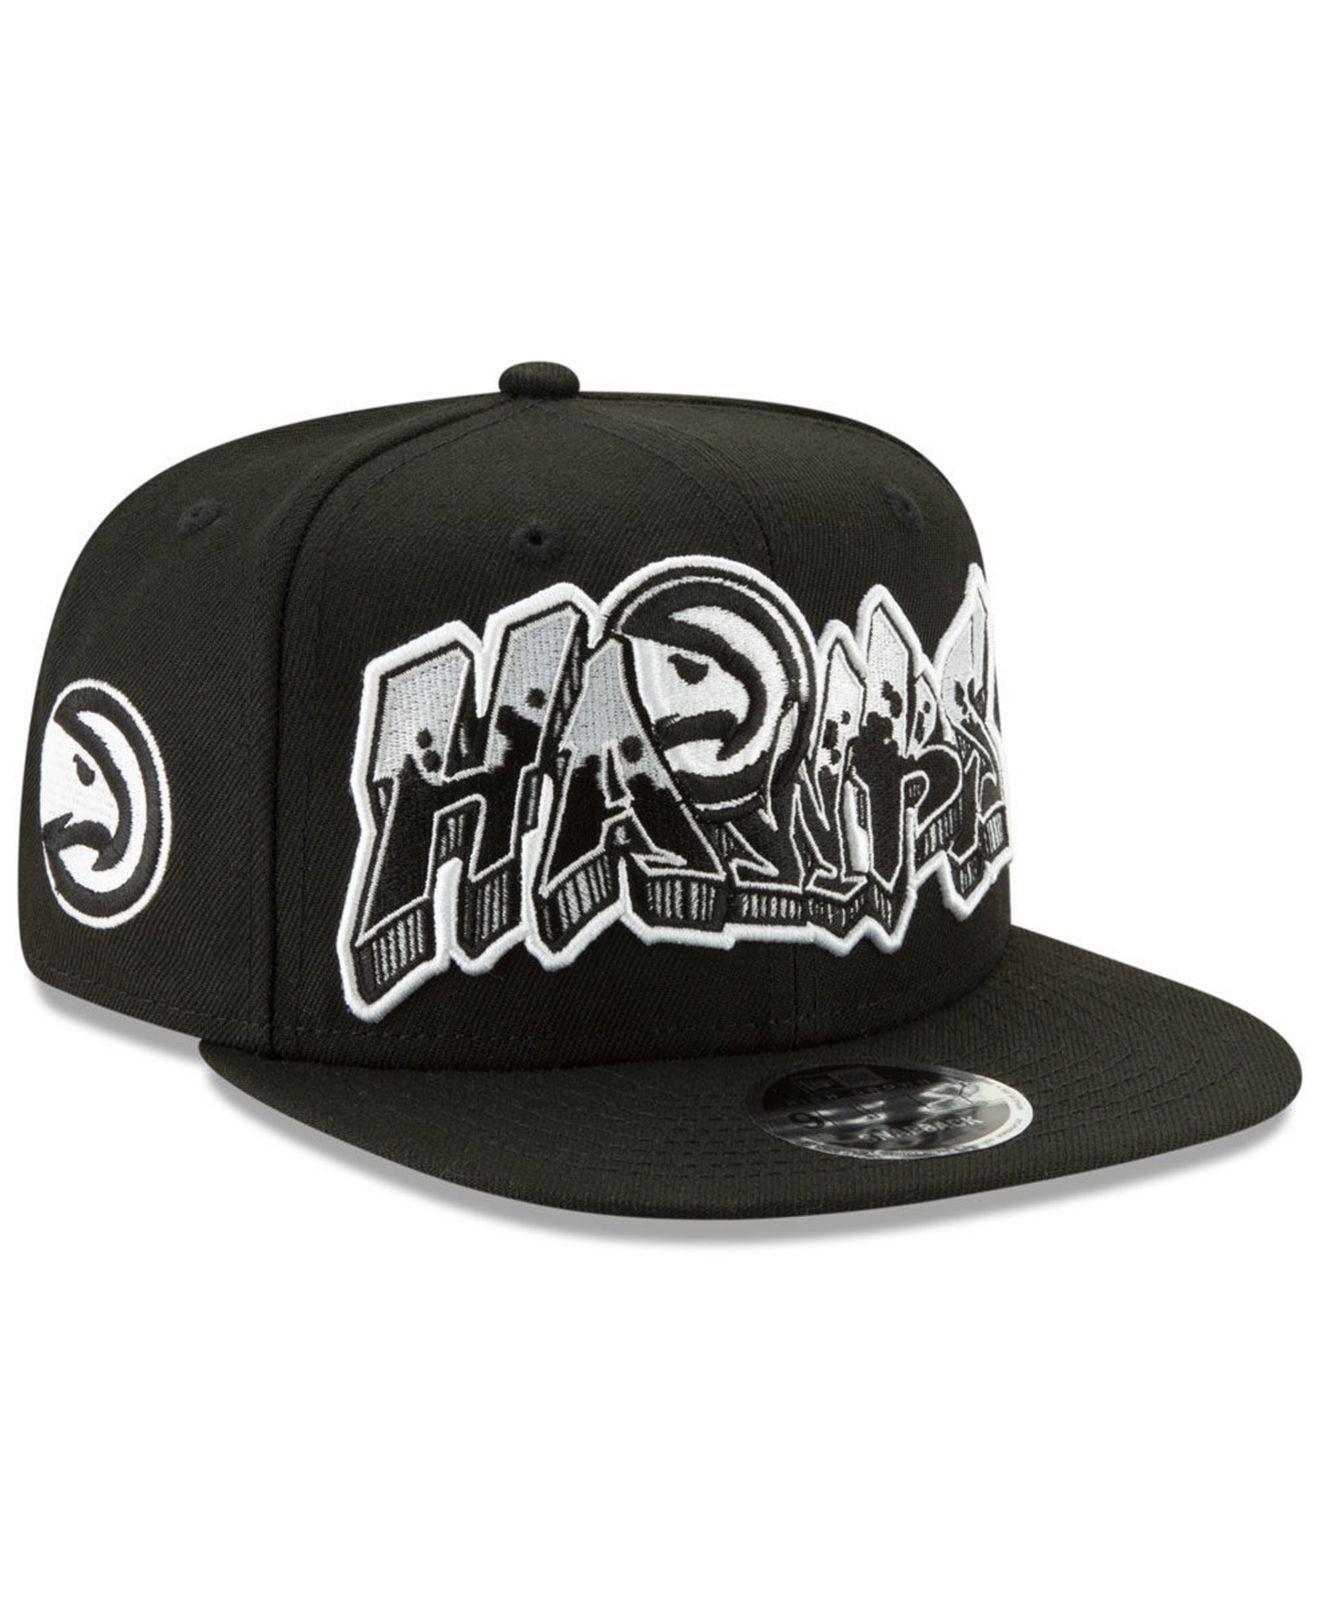 purchase cheap fa378 92923 ... promo code ktz atlanta hawks retroword black white 9fifty snapback cap  for men lyst. view